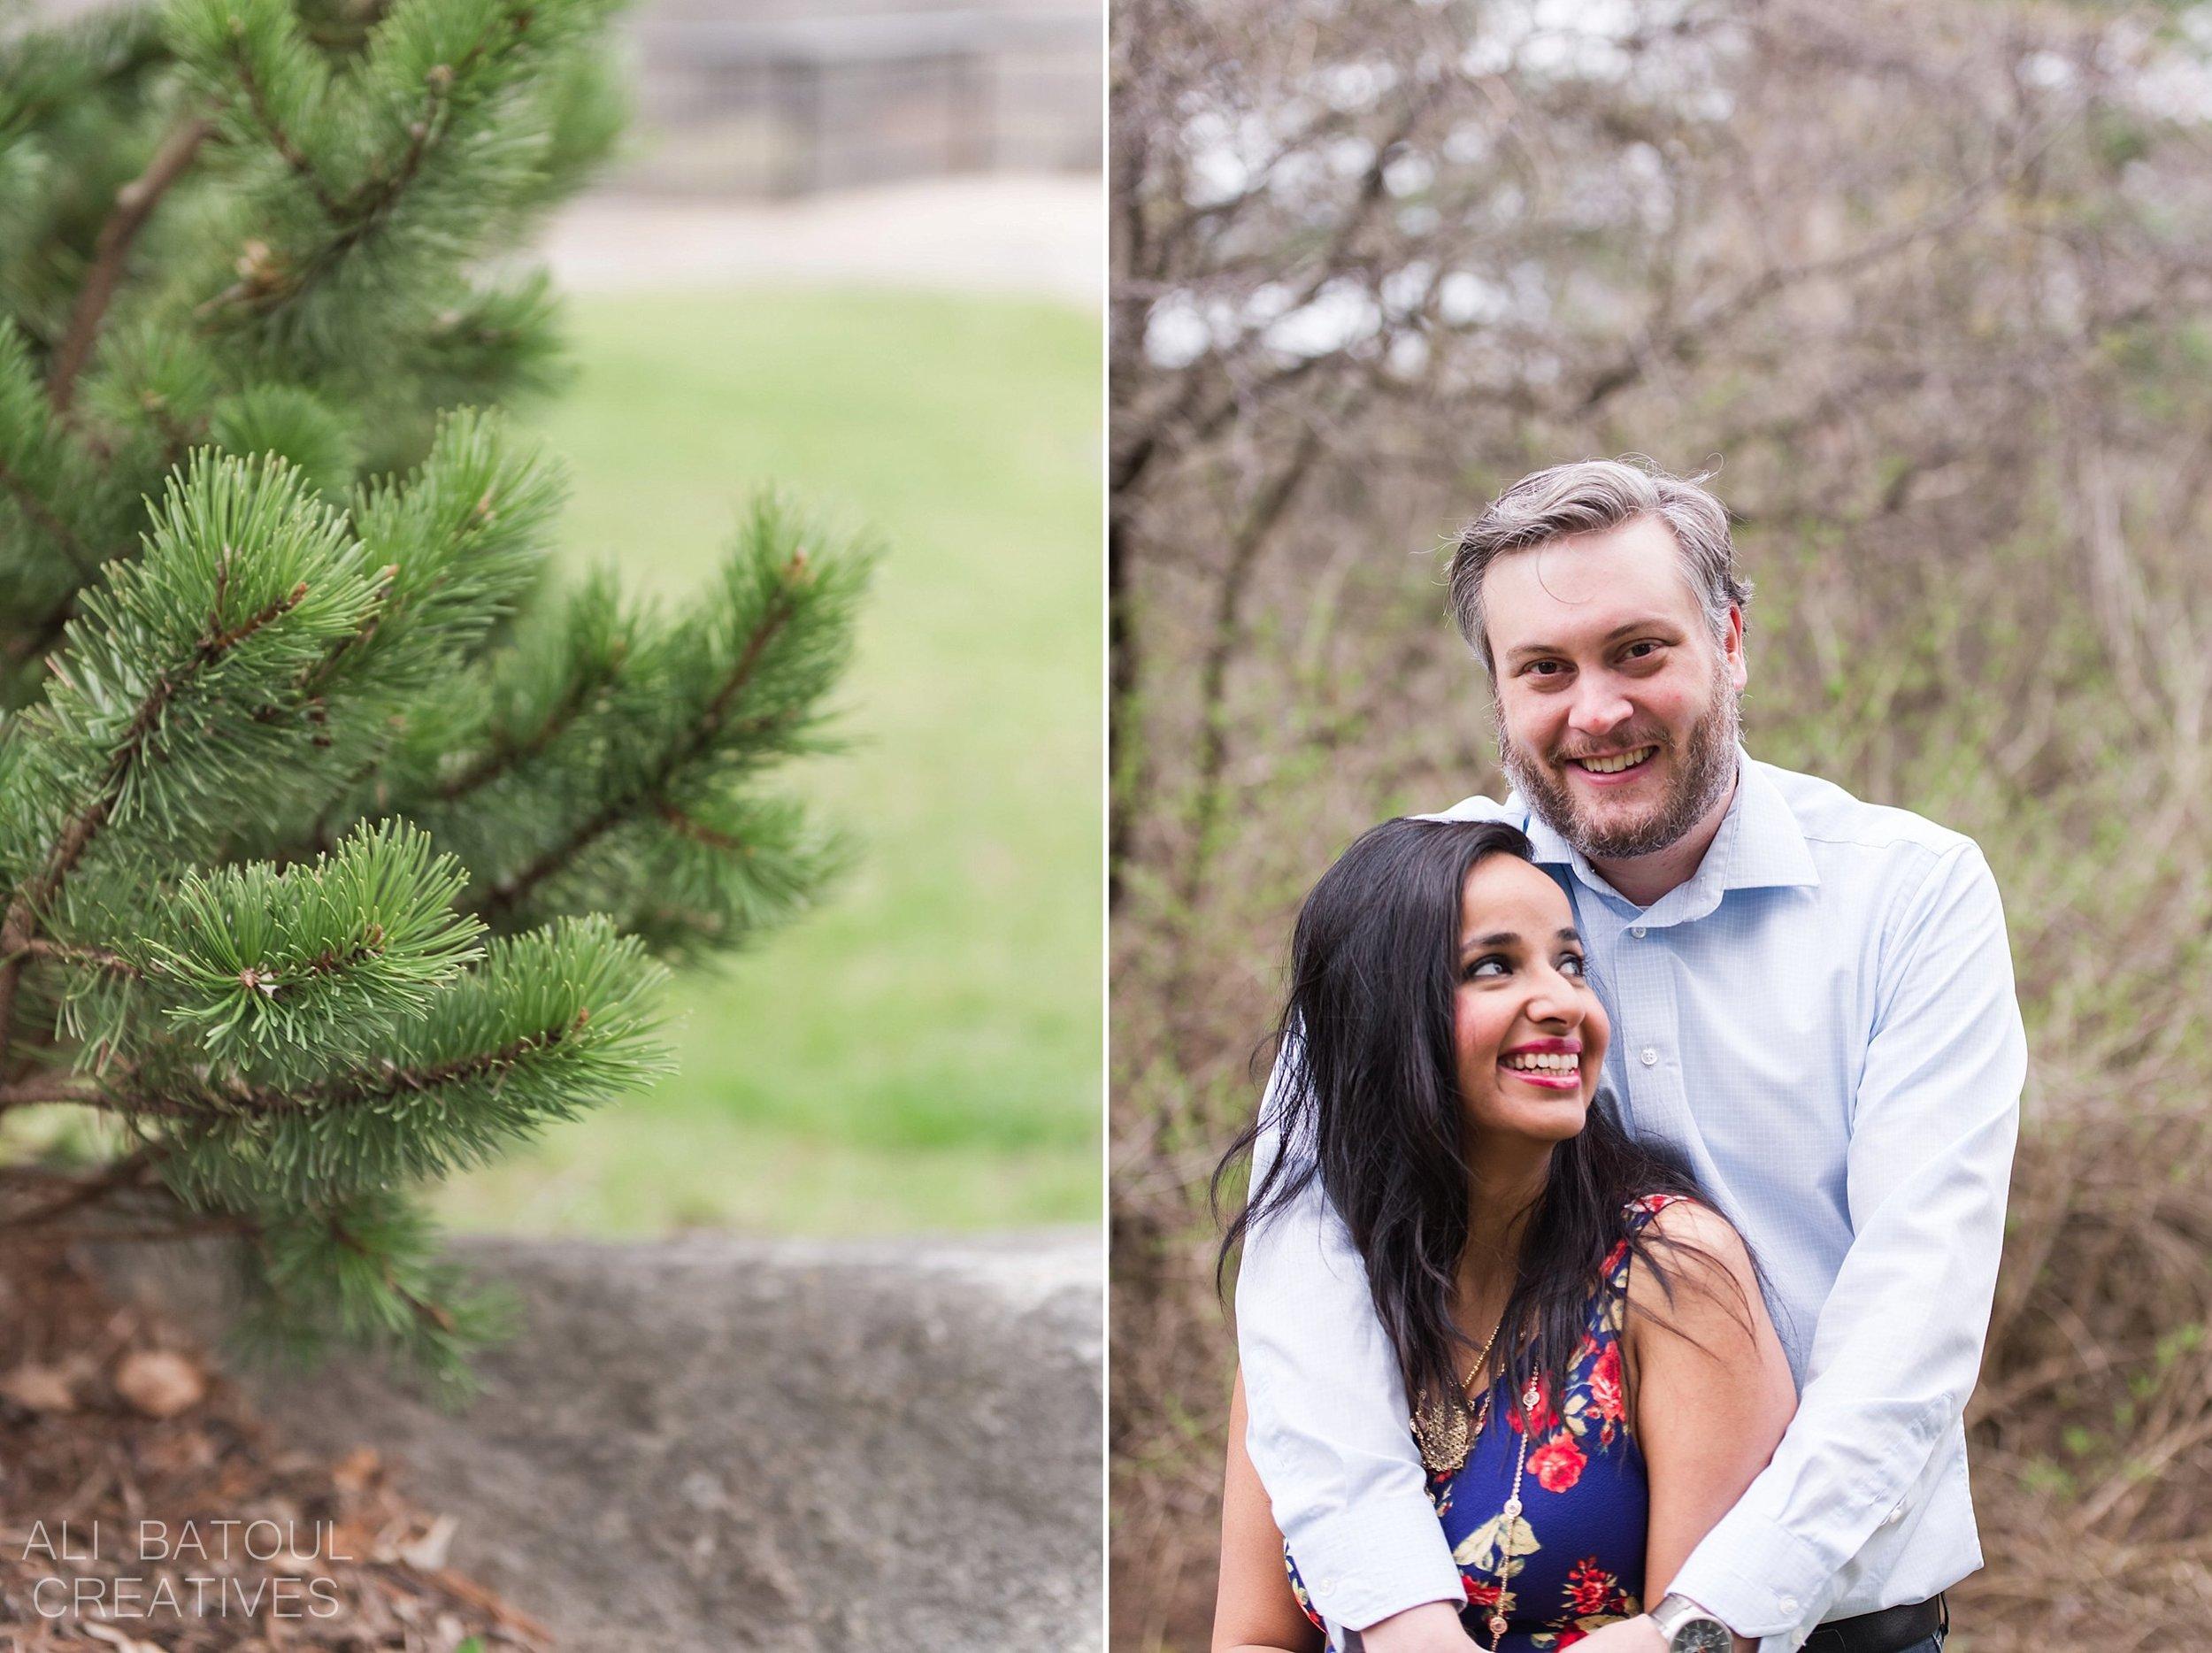 Uzma + Ian Engagement - Ali Batoul Creatives Fine Art Wedding Photography_0197.jpg